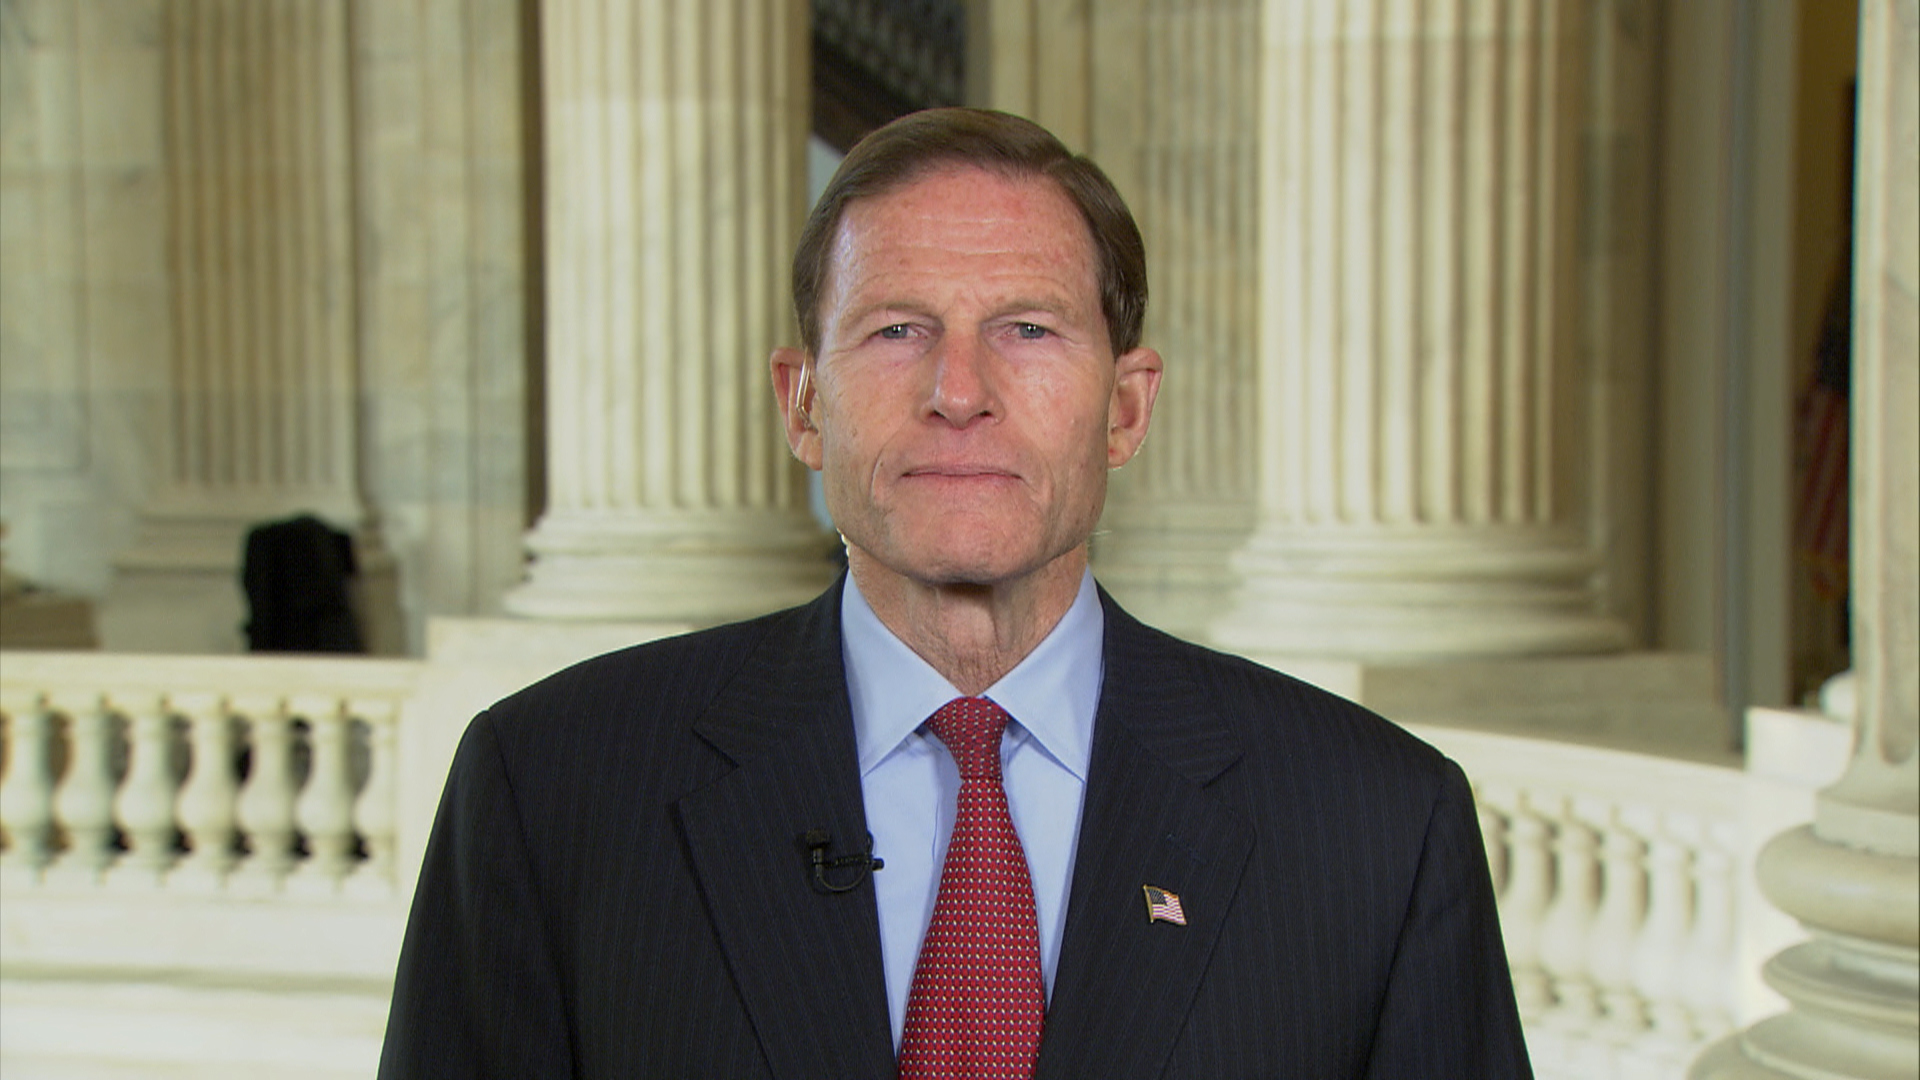 Senator 'inspired by strength' of Newtown